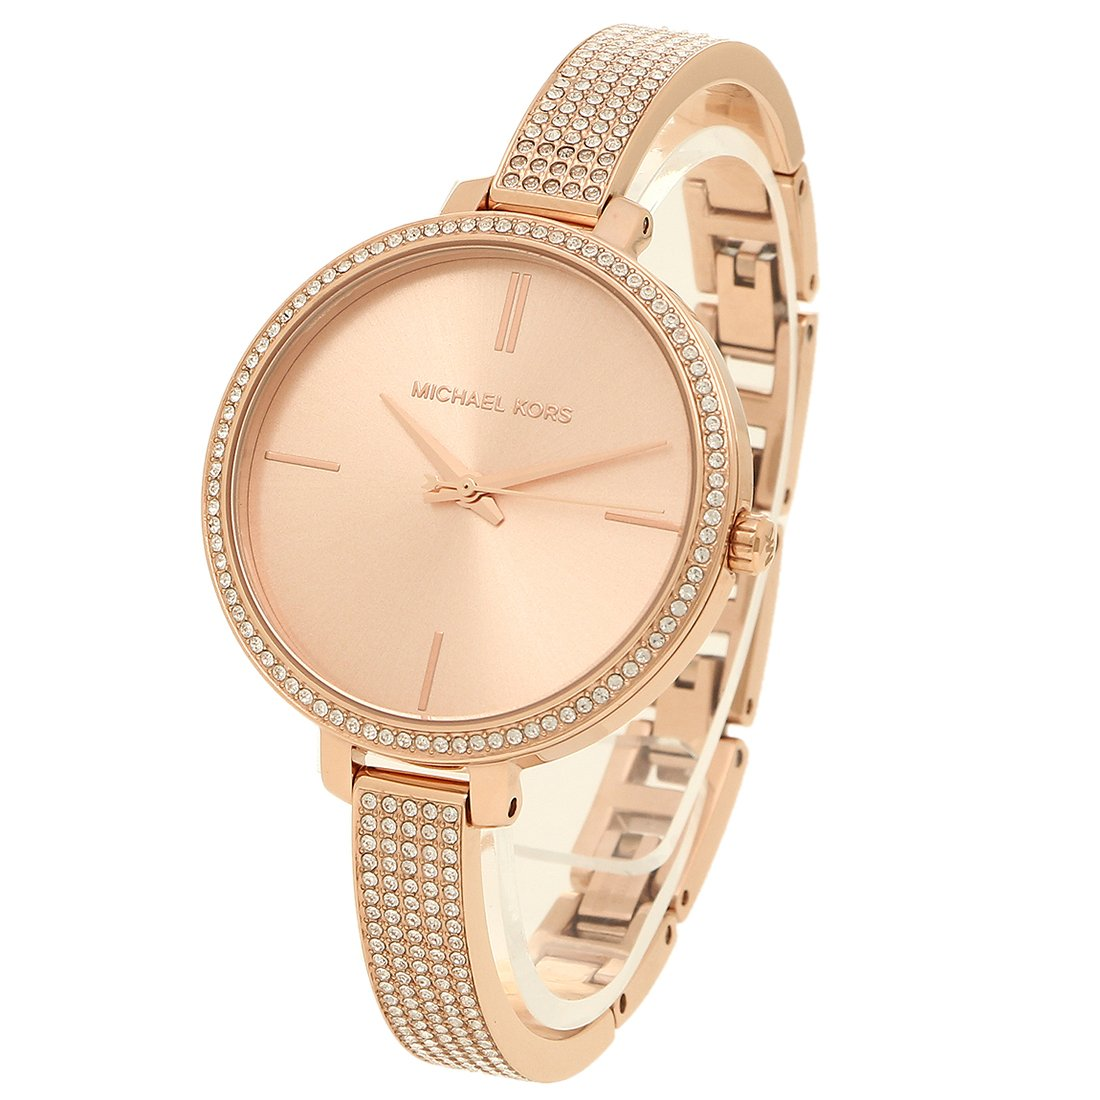 b052ae76bd4c Amazon | [マイケルコース] 腕時計 レディース MICHAEL KORS MK3785 ローズゴールド [並行輸入品] | 並行輸入品・逆輸入 品・中古品(レディース) | 腕時計 通販